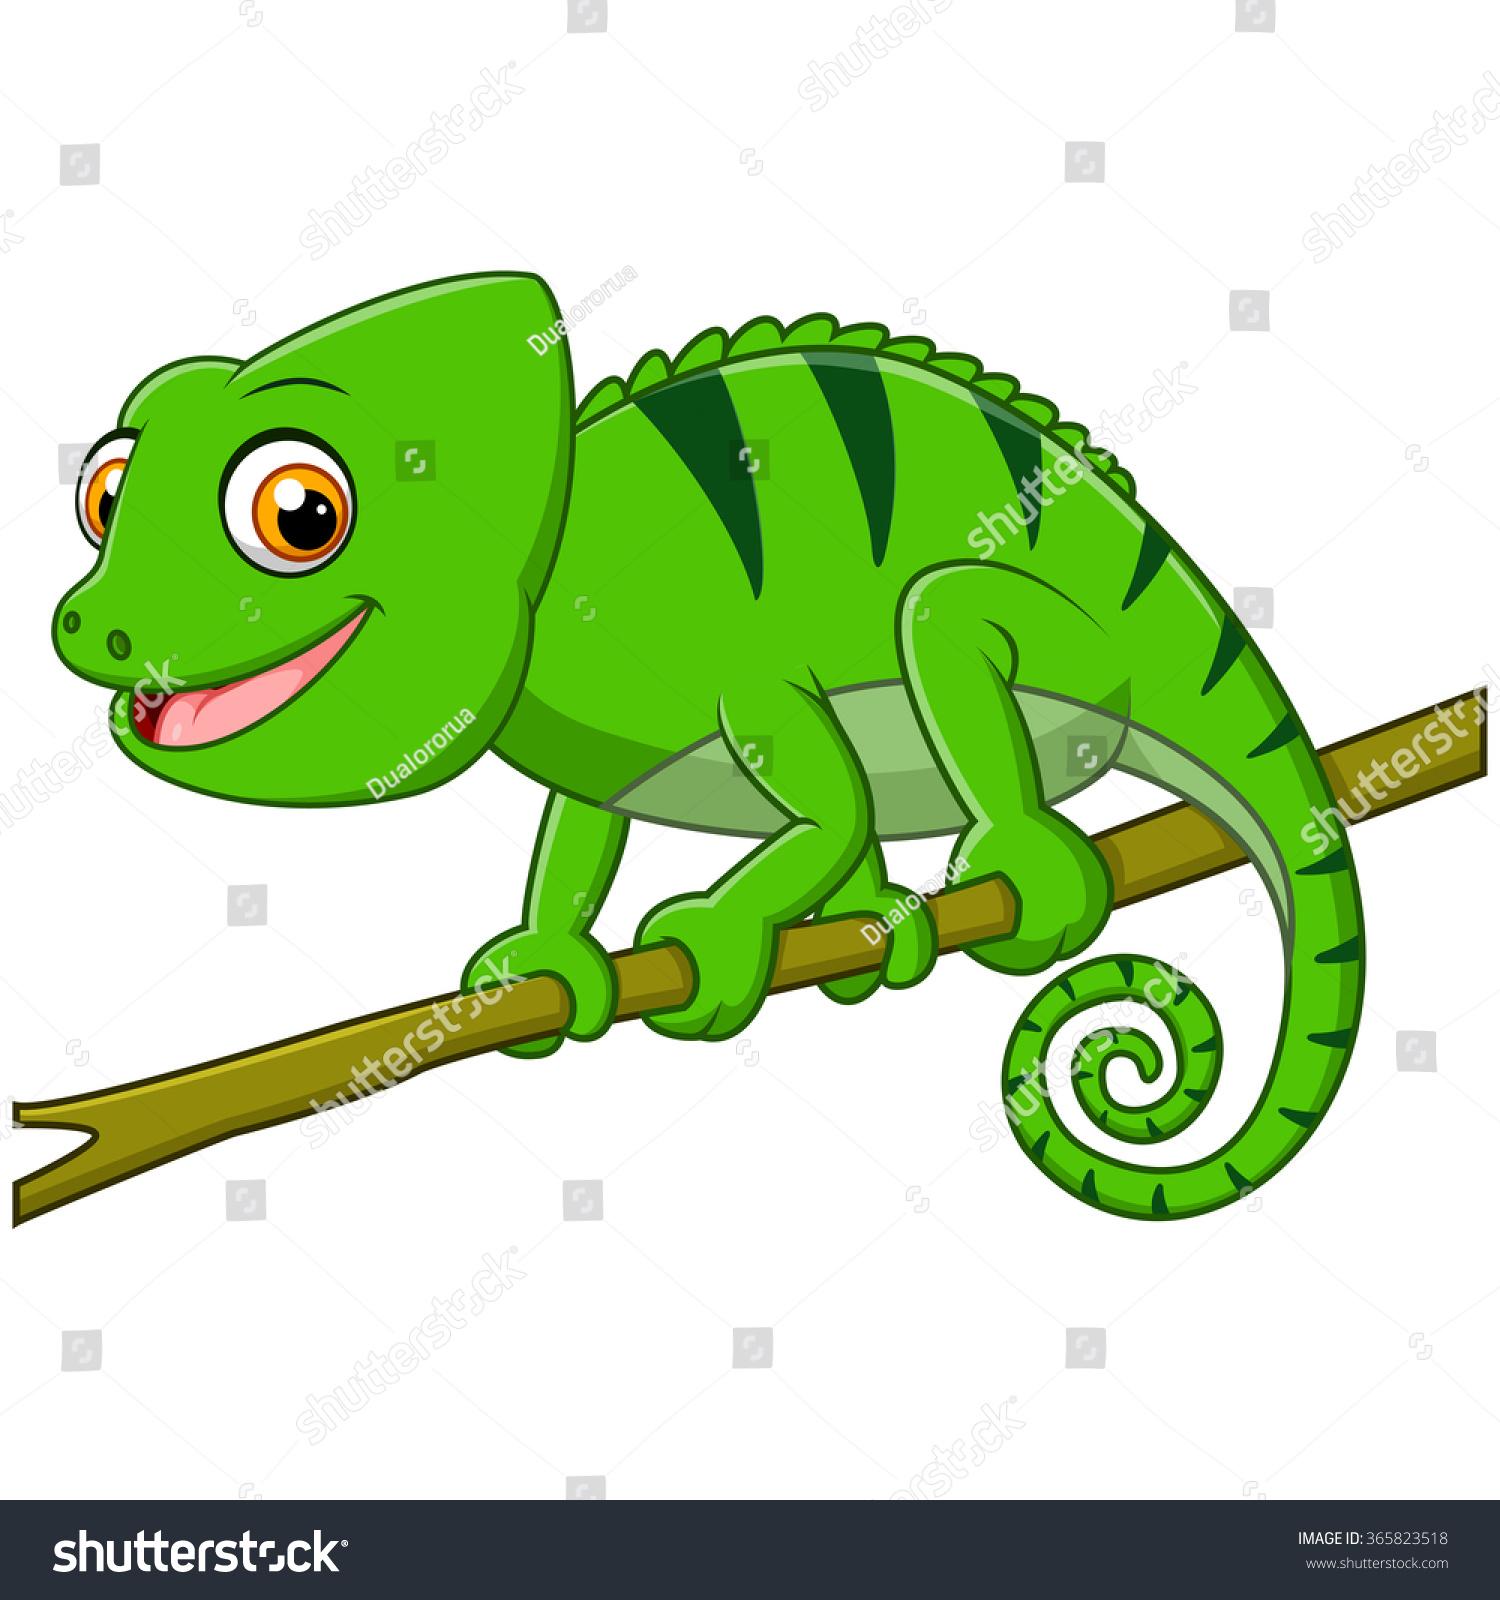 Cartoon Lizard On Branch Stock Illustration 365823518 ...